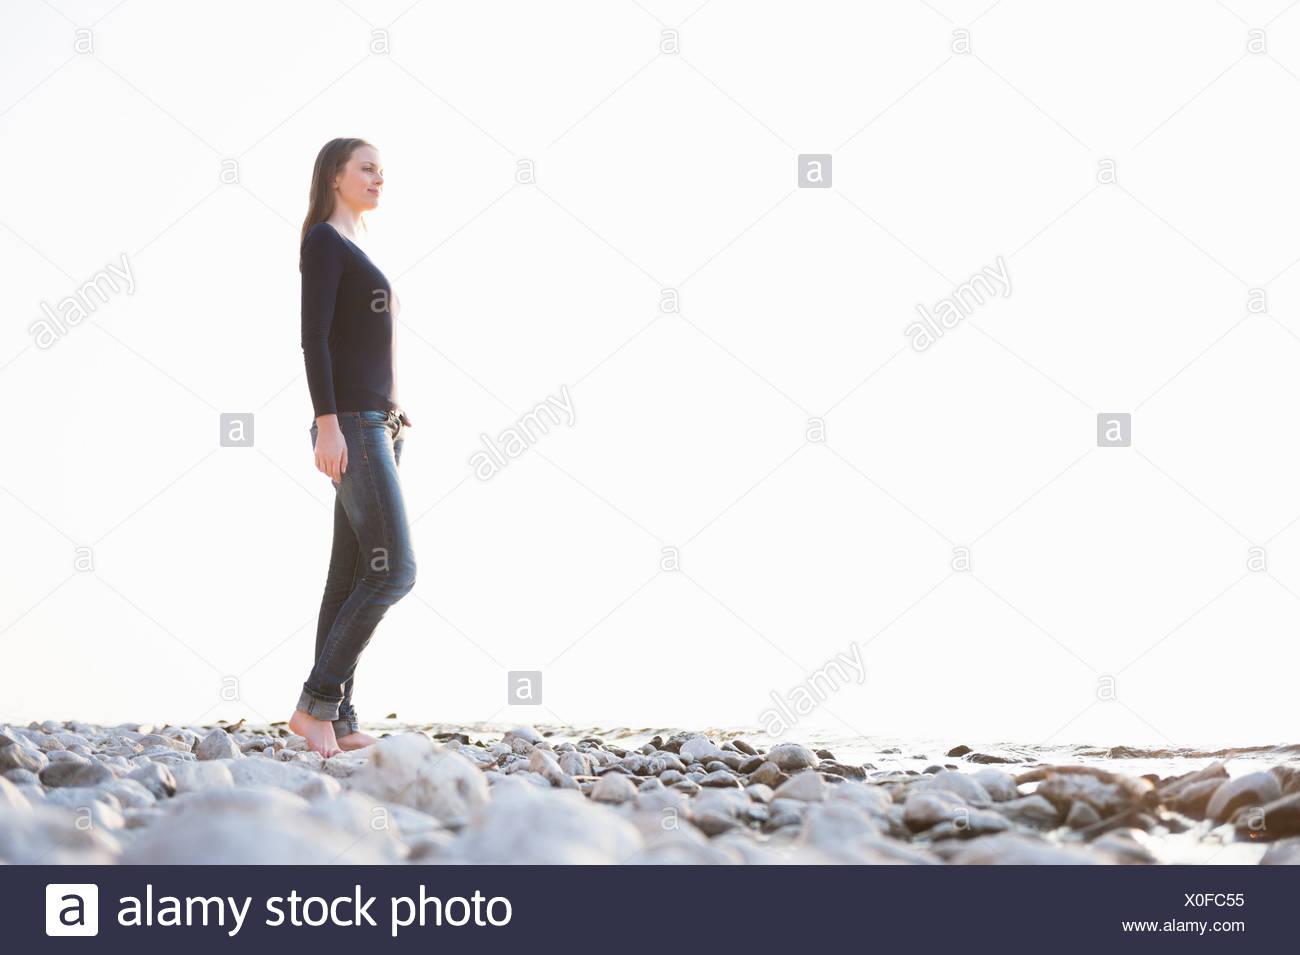 Young woman enjoying stroll at coast - Stock Image